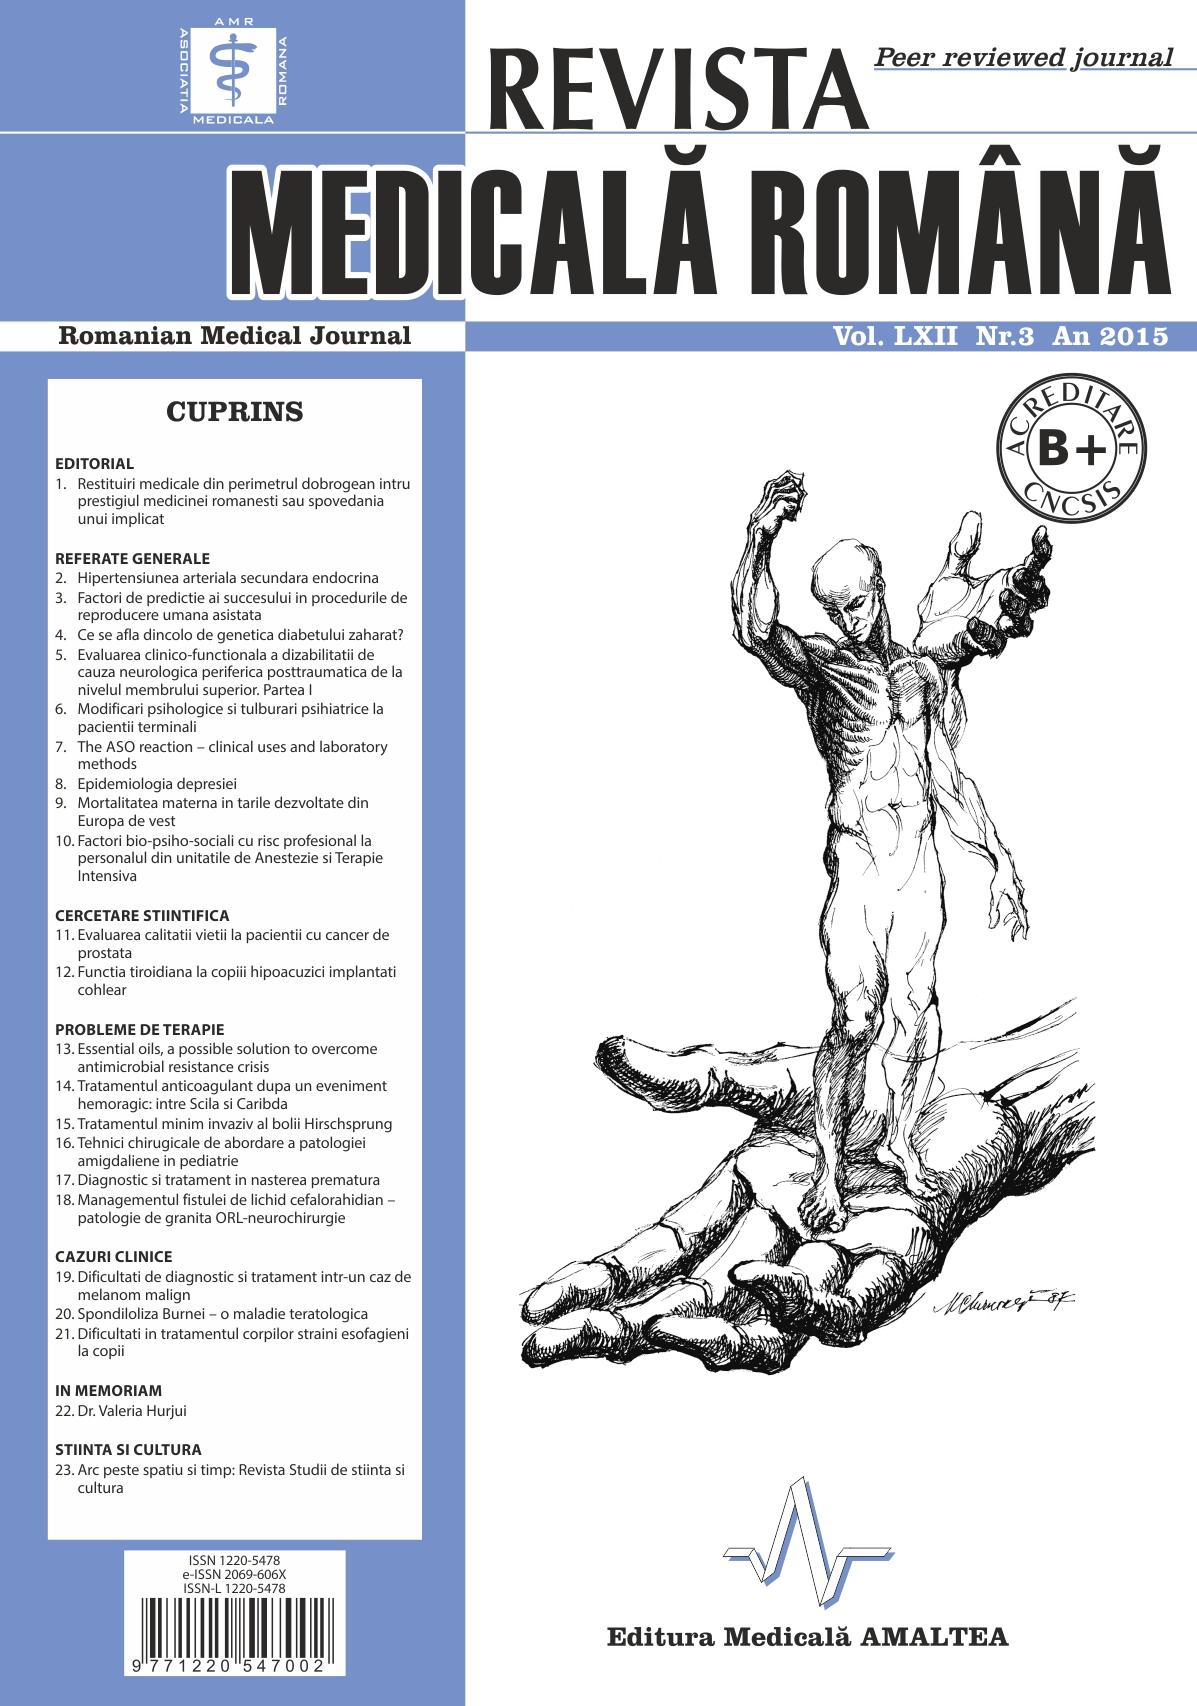 REVISTA MEDICALA ROMANA - Romanian Medical Journal, Vol. LXII, Nr. 3, An 2015